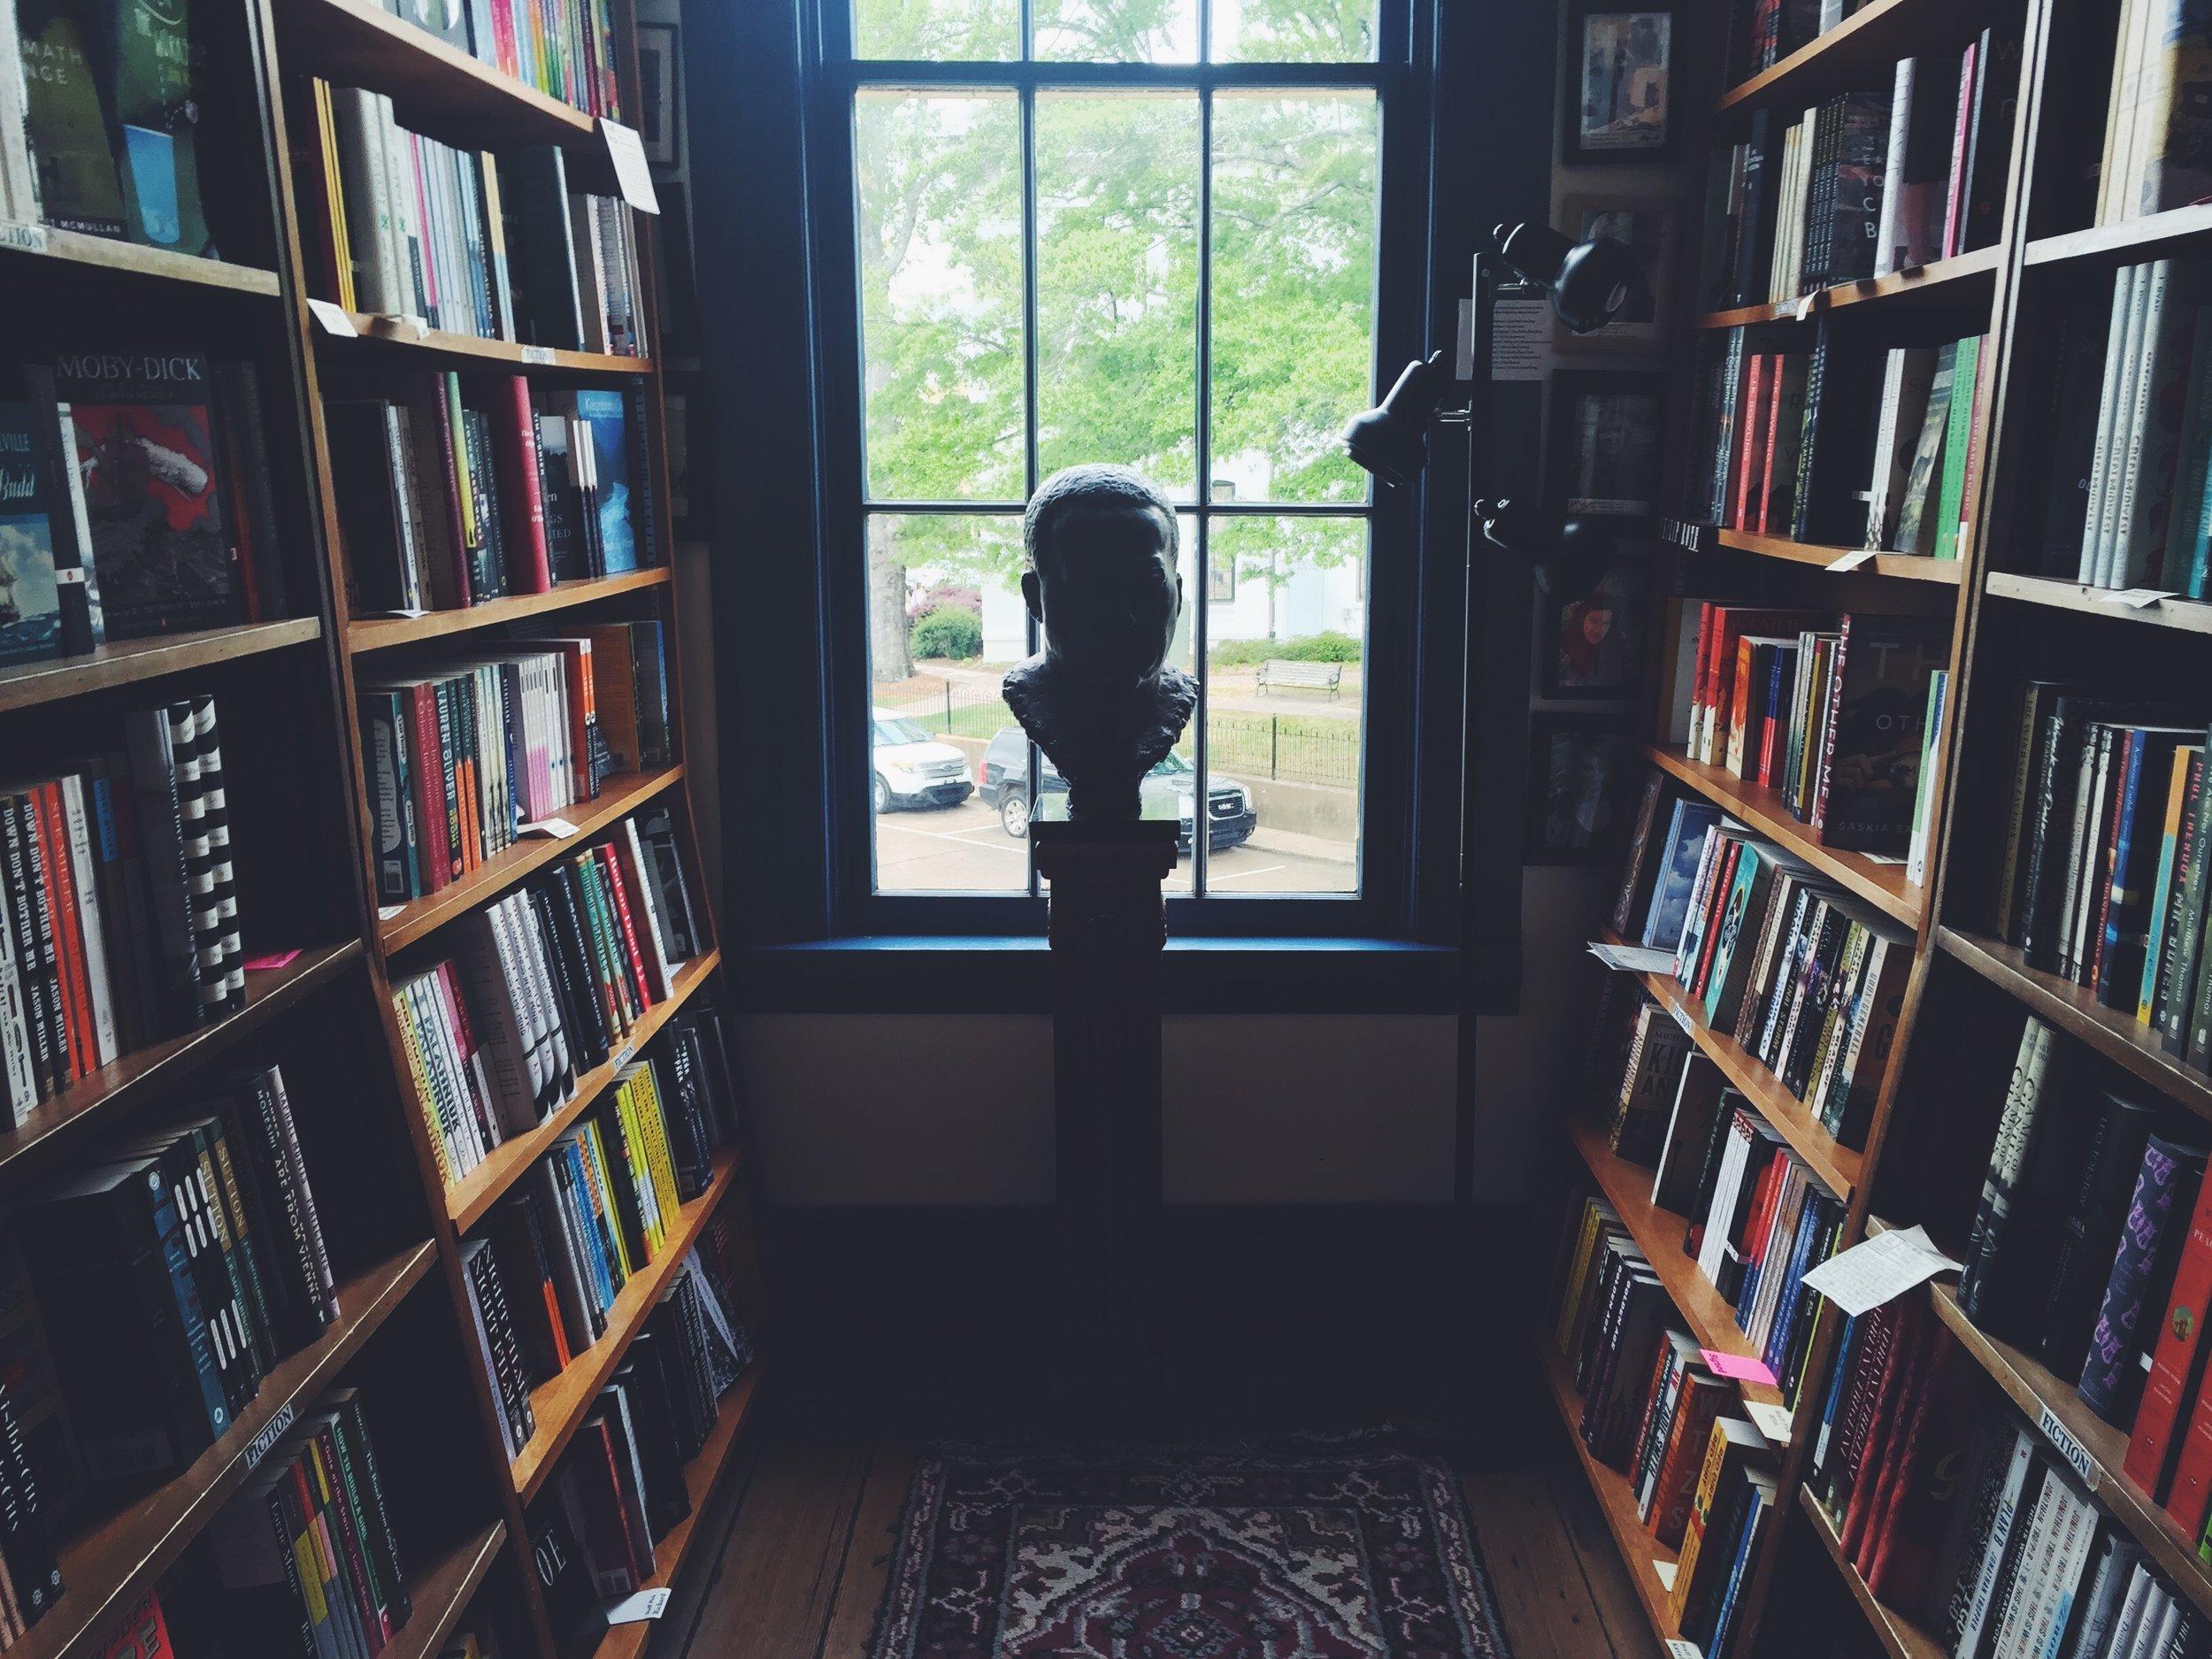 My favorite bookstore in the world,  Square Books in  Oxford, Mississippi.